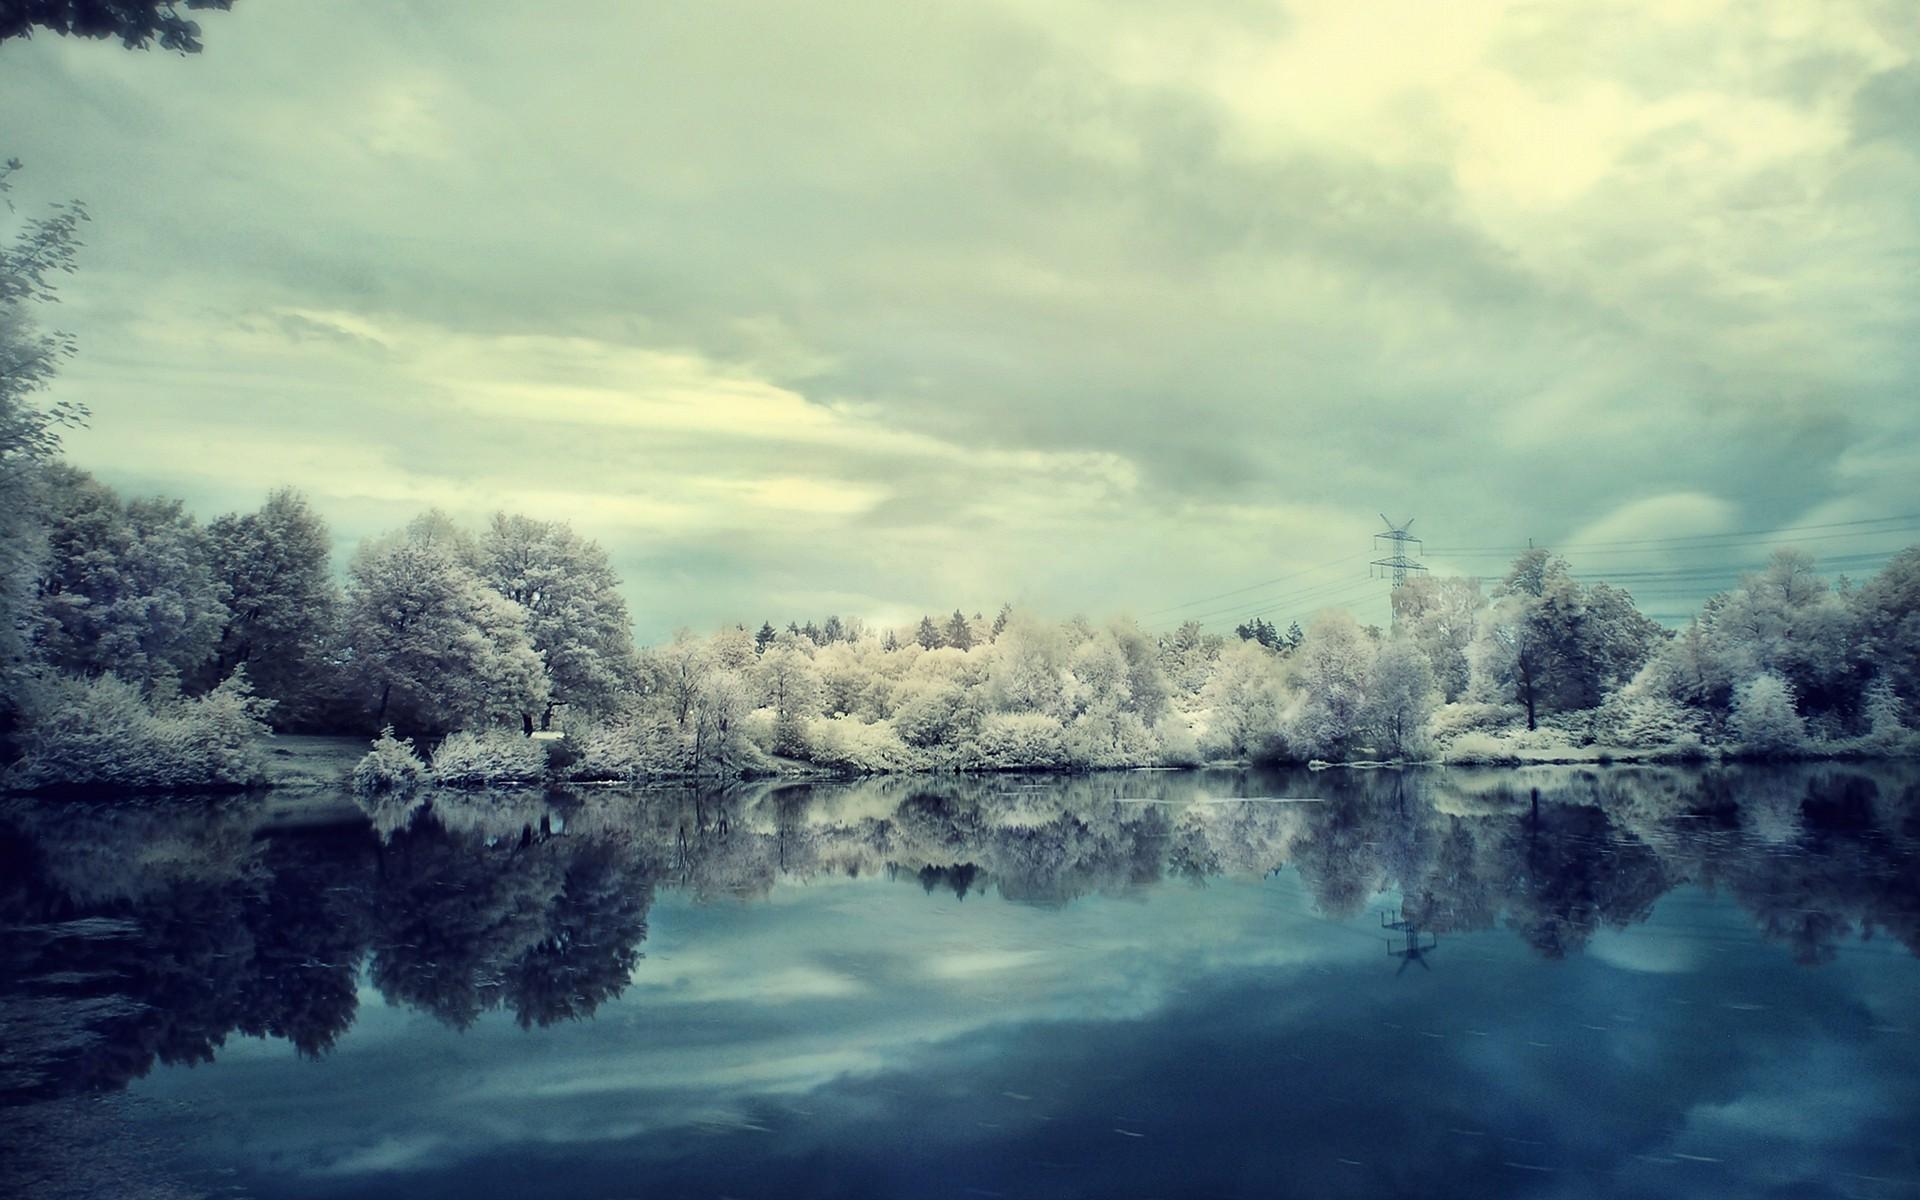 frosty wallpaper download